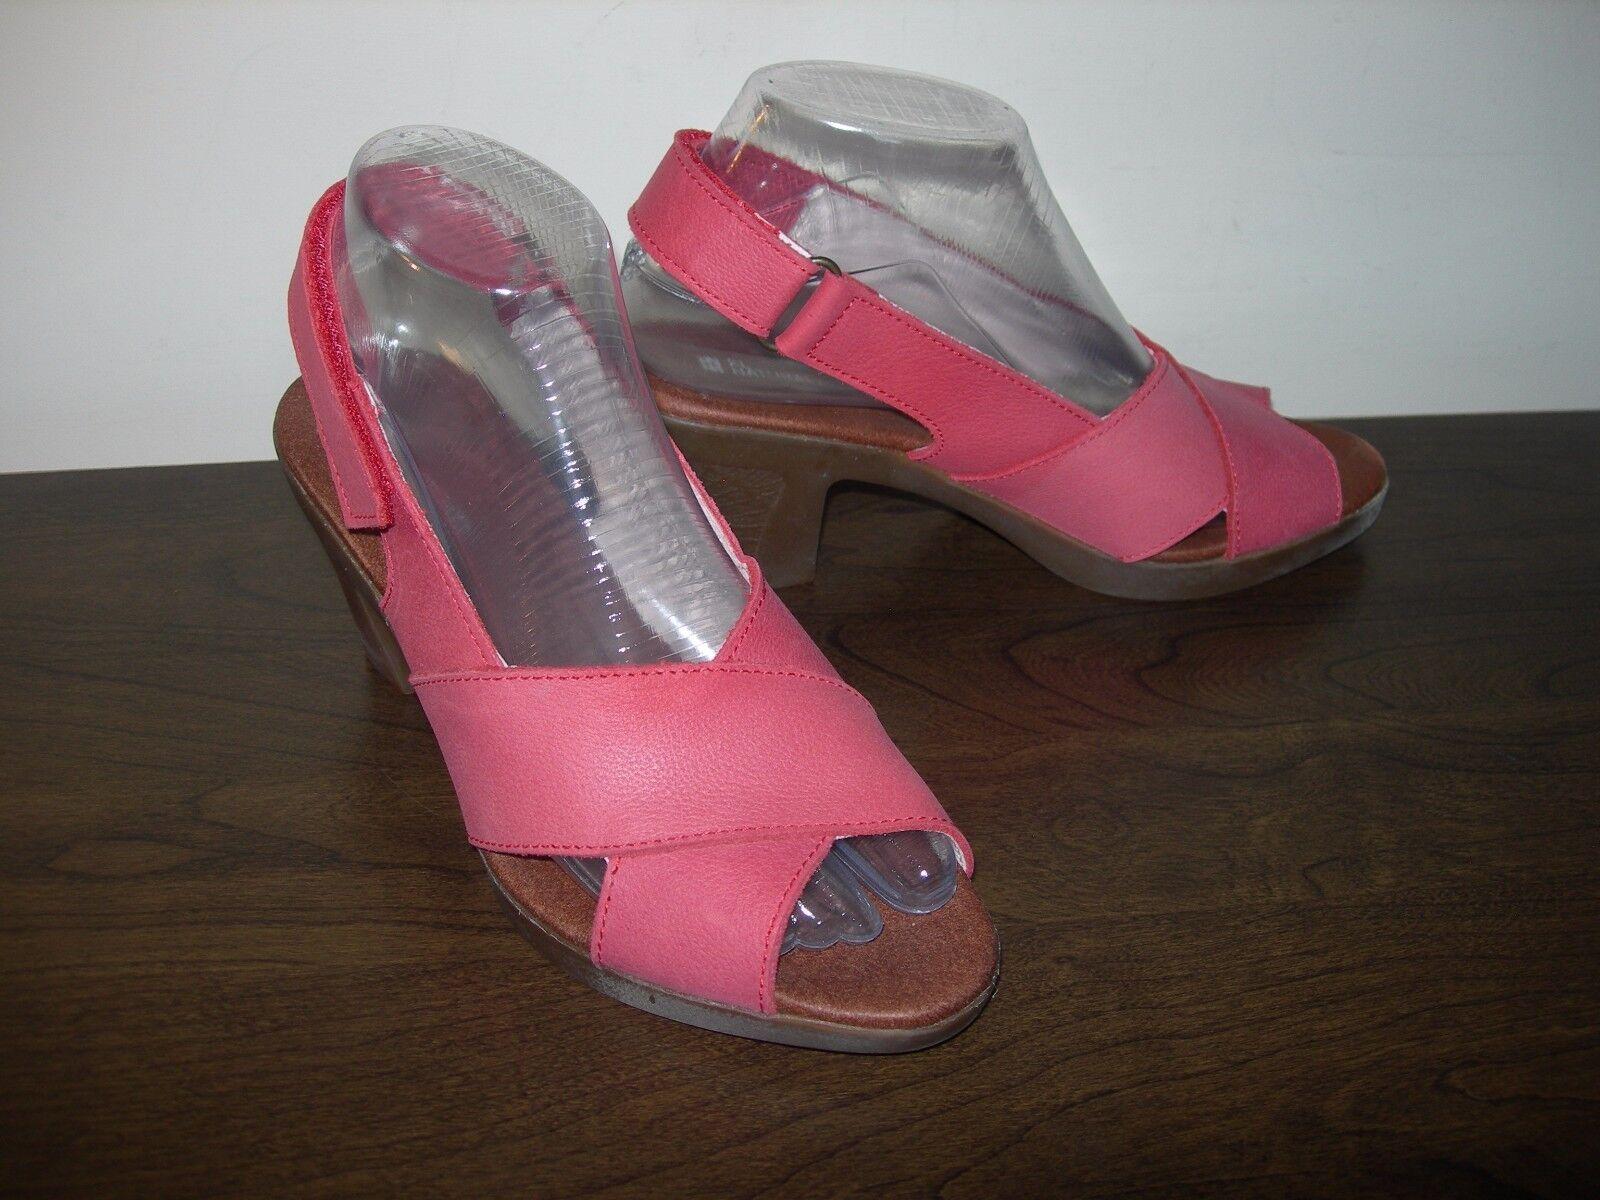 EL NATURALISTA WOMEN'S Schuhe SANDALS SLINGBACKS PALE ROT LEATHER EU 37 / UK 4